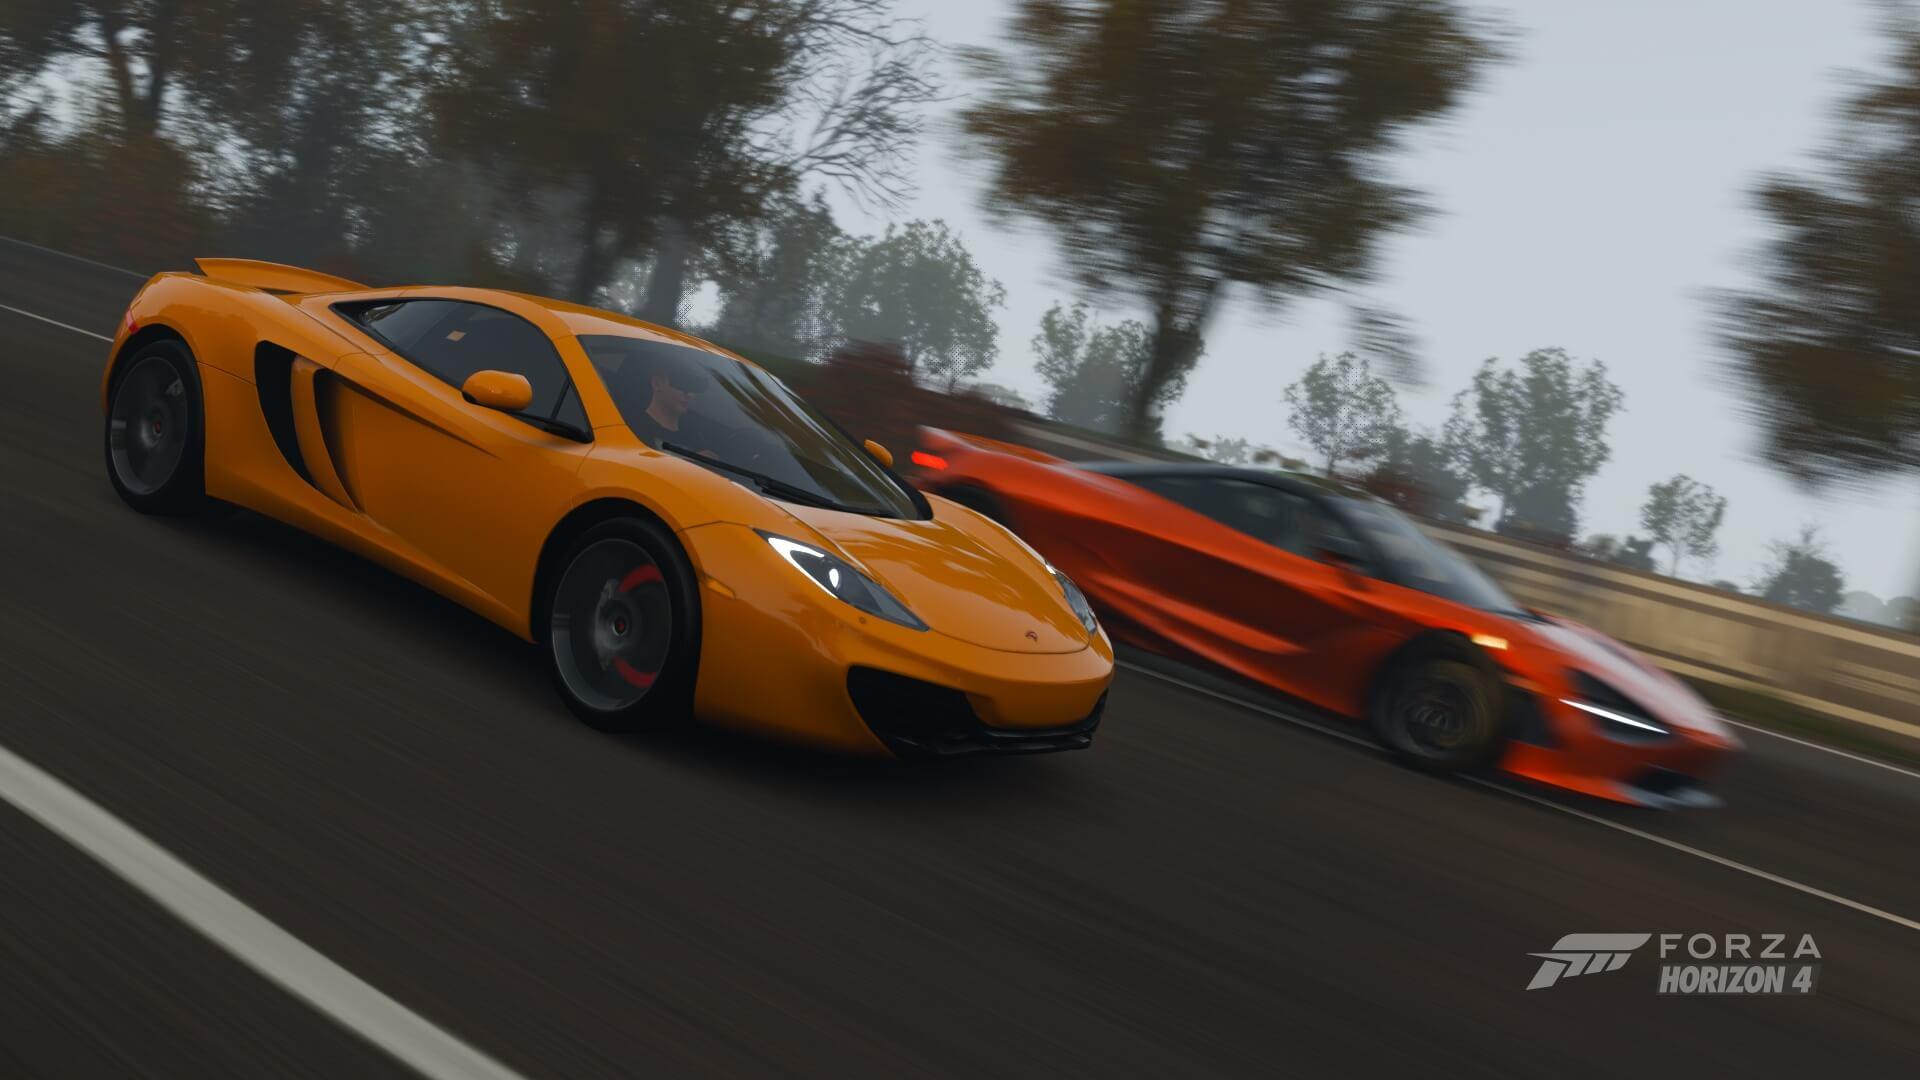 This Week's Forza Horizon 4 Season Change: Rare Cars Return